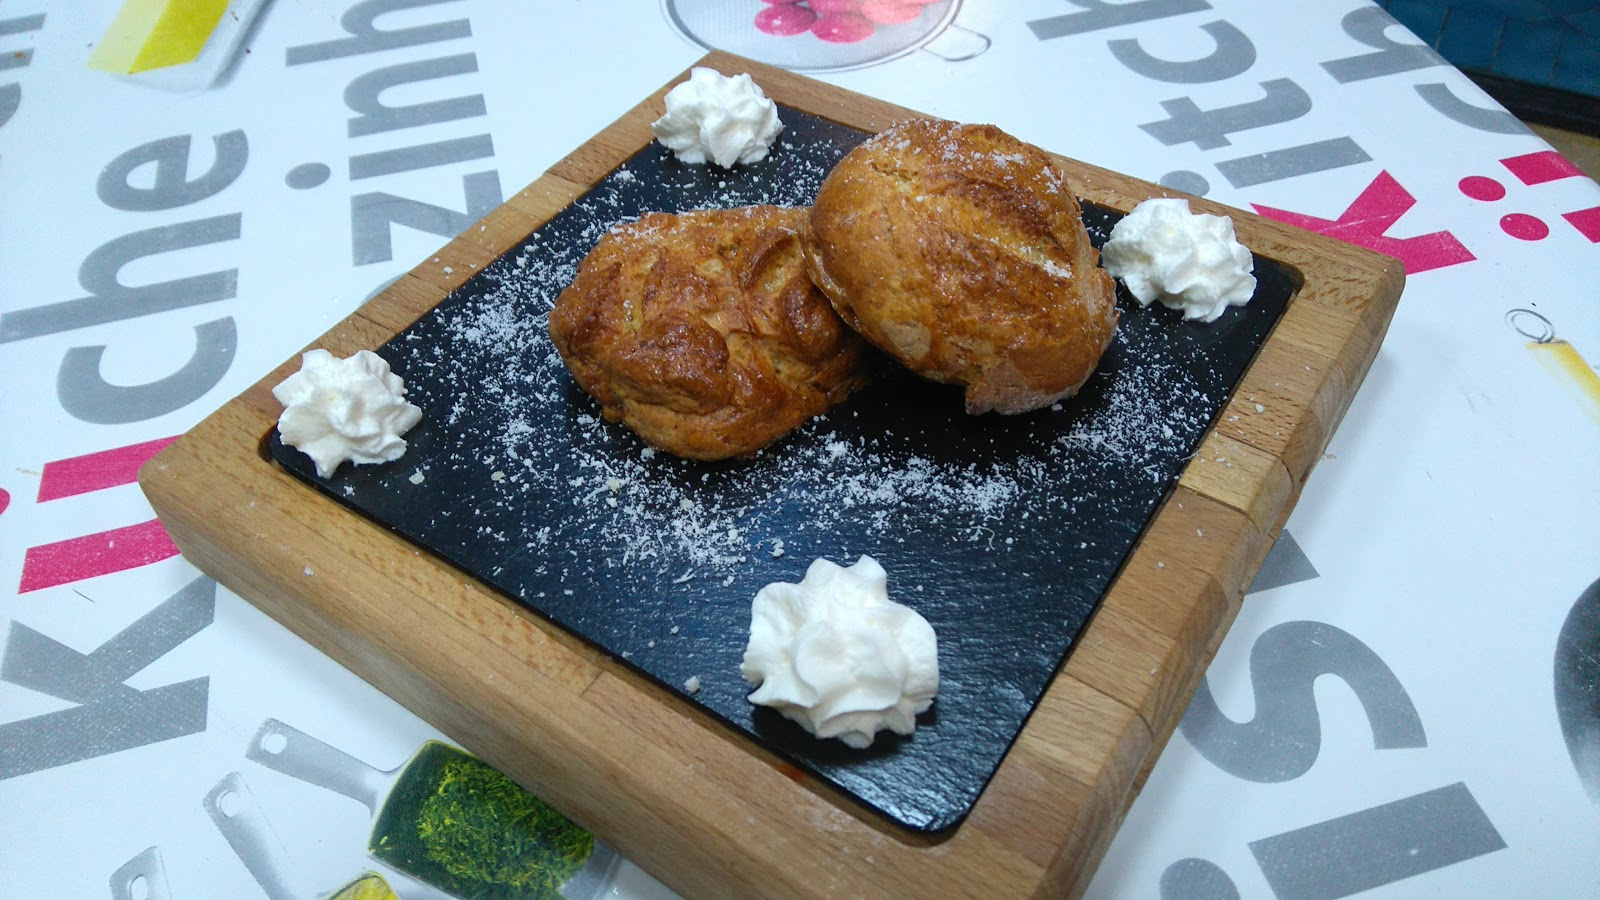 Escuela de cocina pako amor - Escuela de cocina paco amor ...